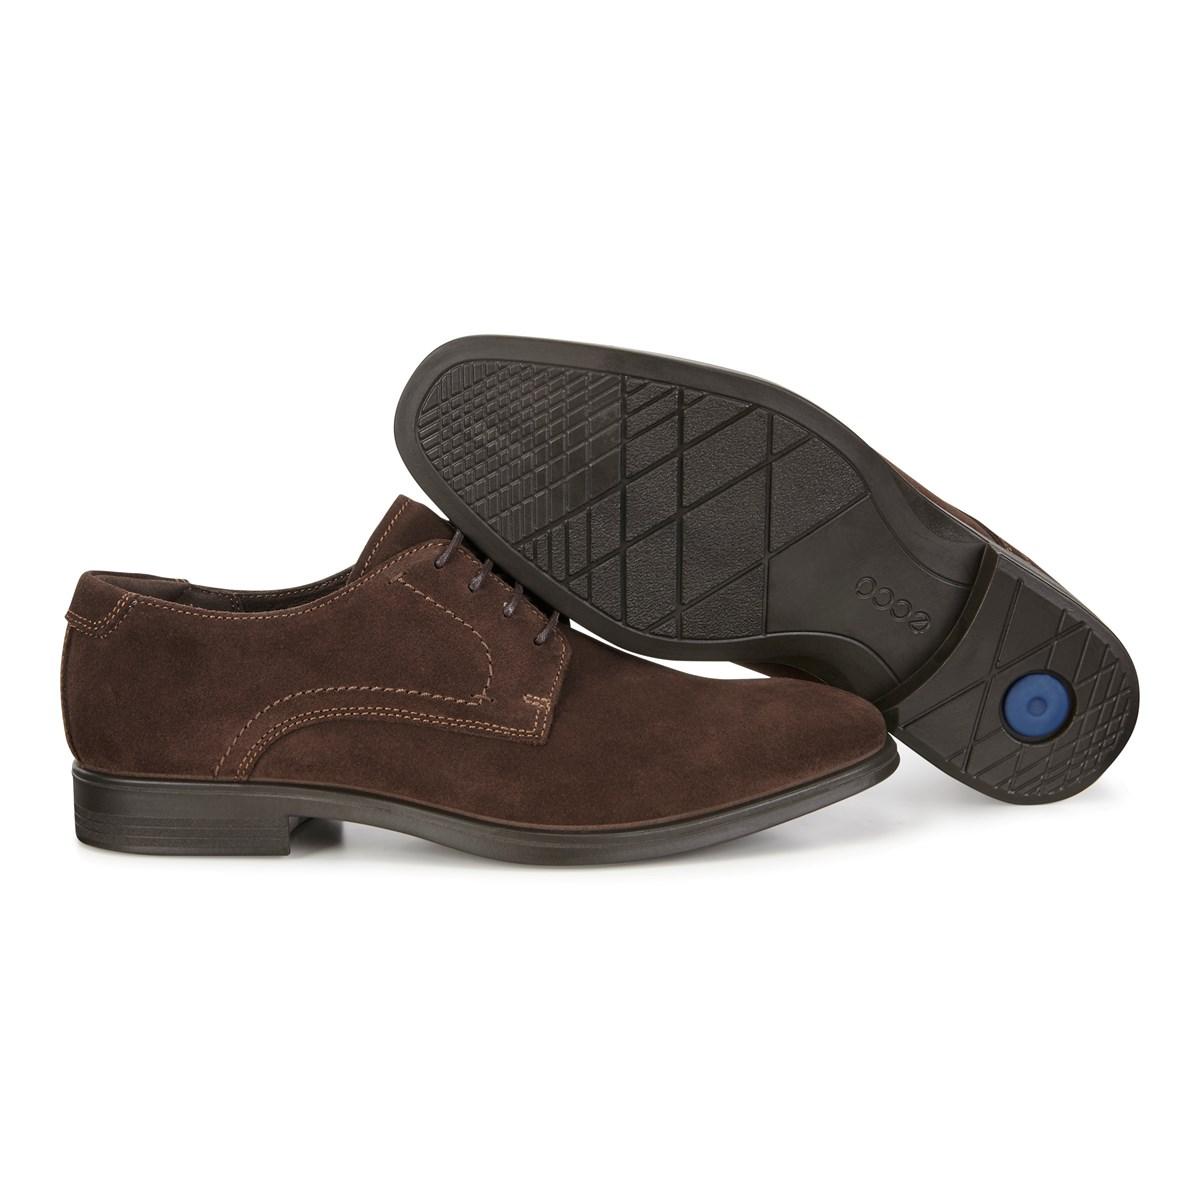 2cb5ab82a574 New Arrivals - MELBOURNE - ECCO Shoes NZ